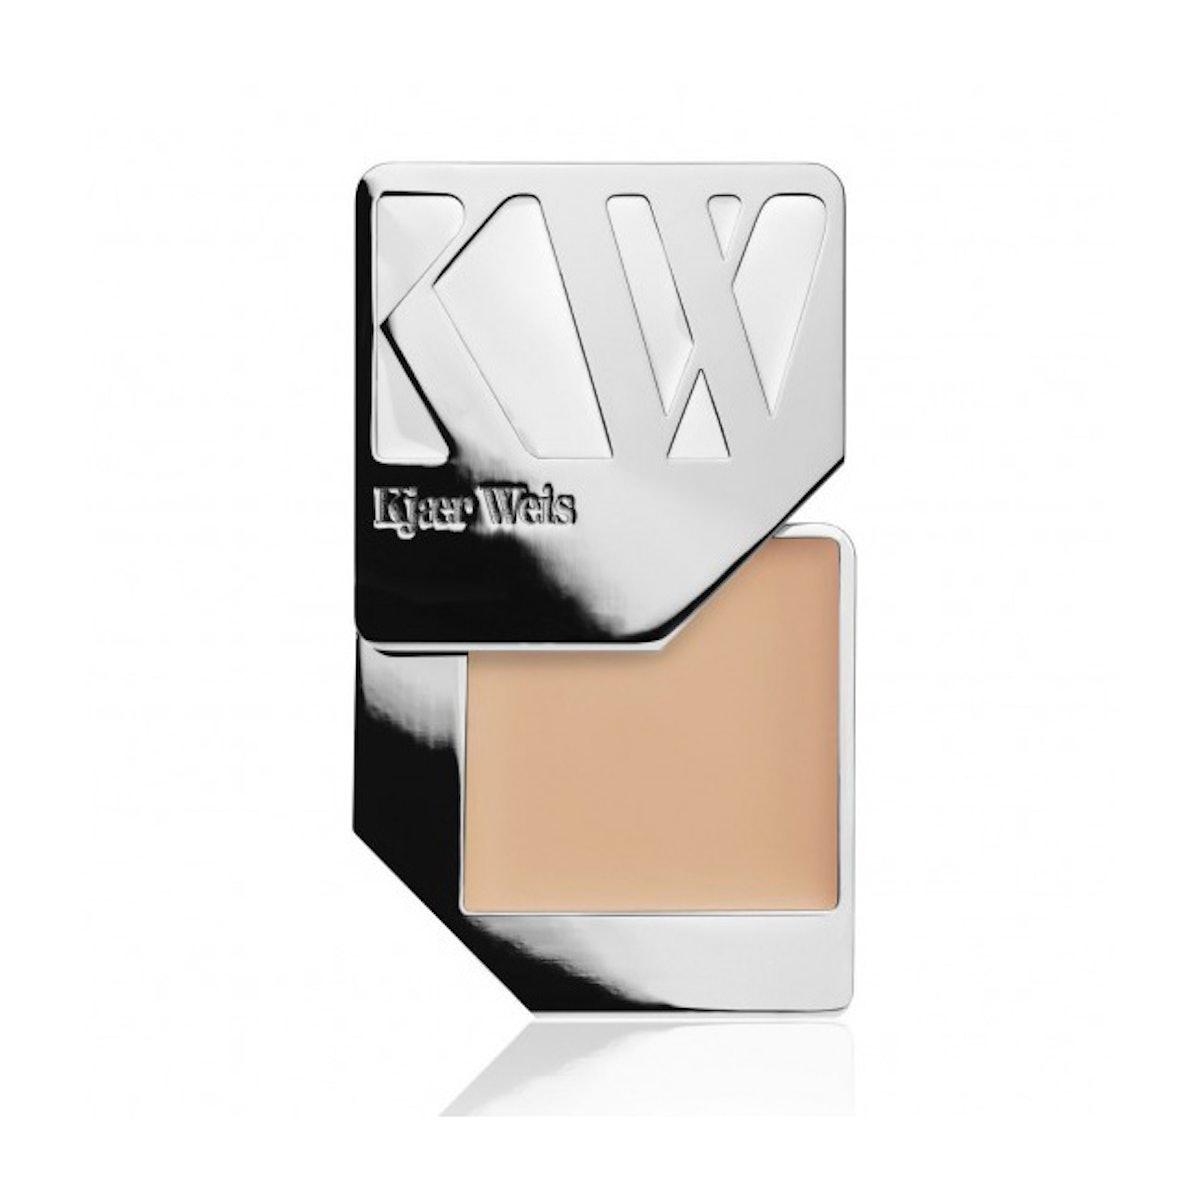 Kjaer Weis foundation